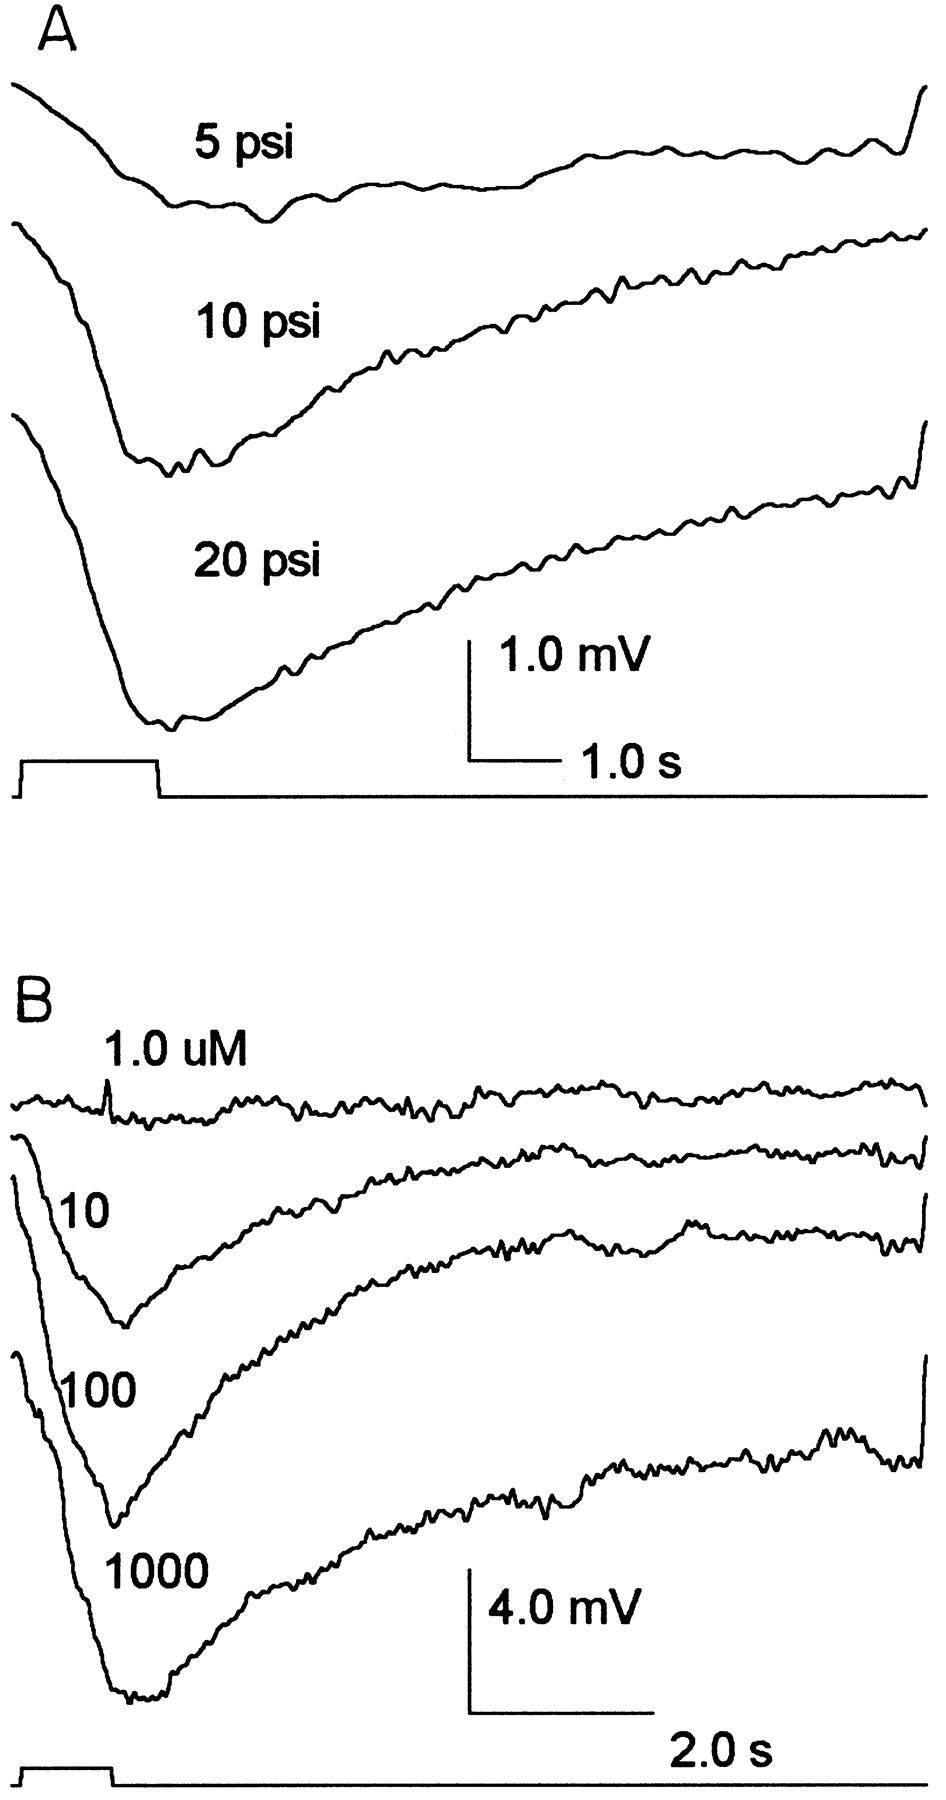 Tachykinin-Related Peptide and GABA-Mediated Presynaptic Inhibition